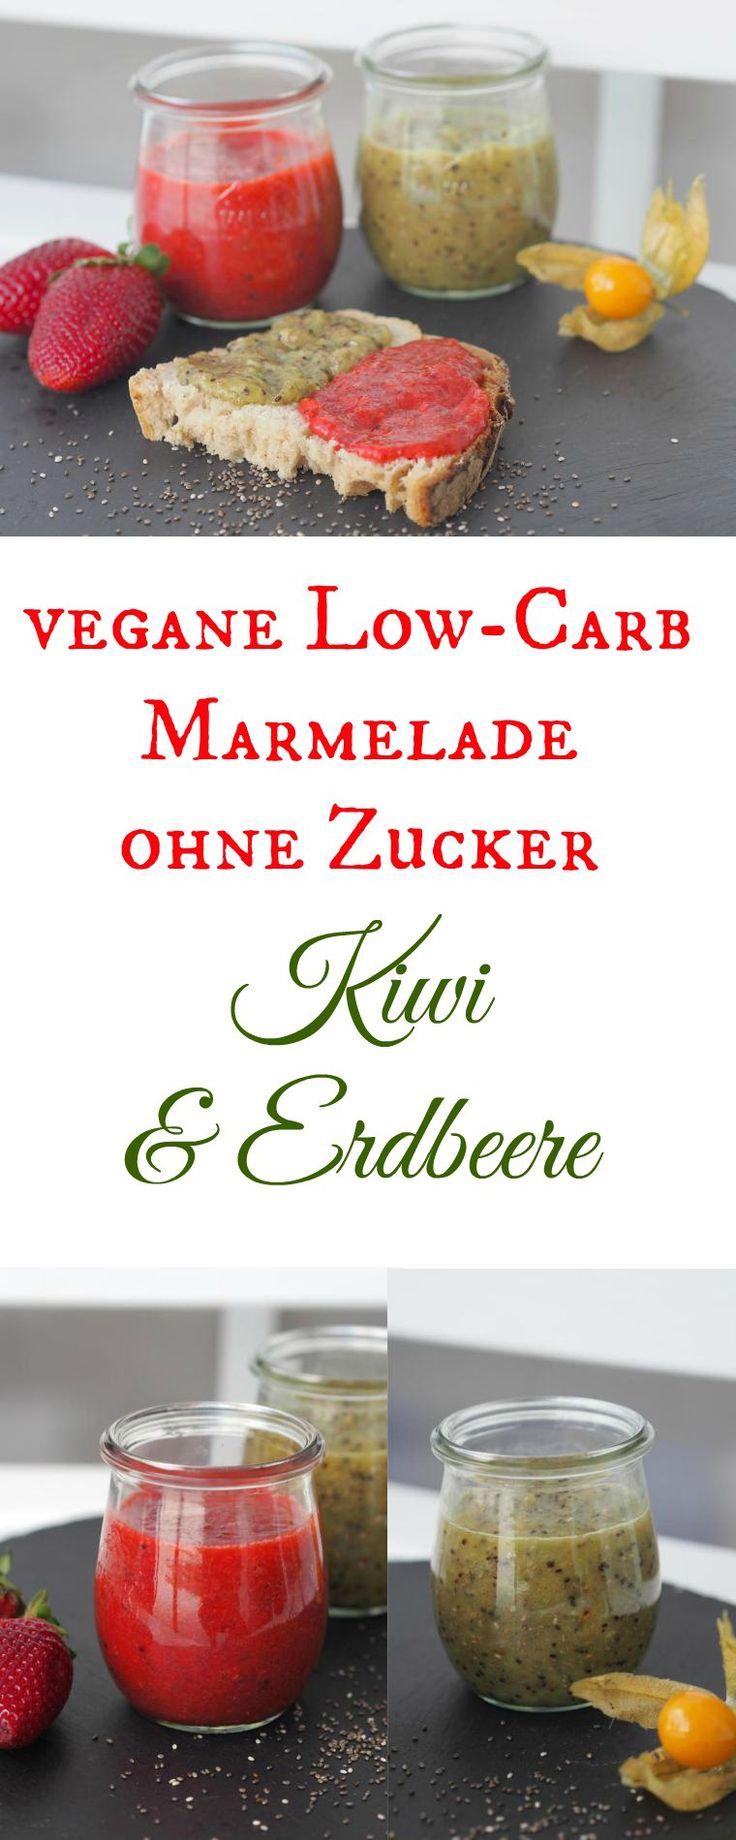 Low Carb Marmelade ohne Zucker: Kiwi & Erdbeere